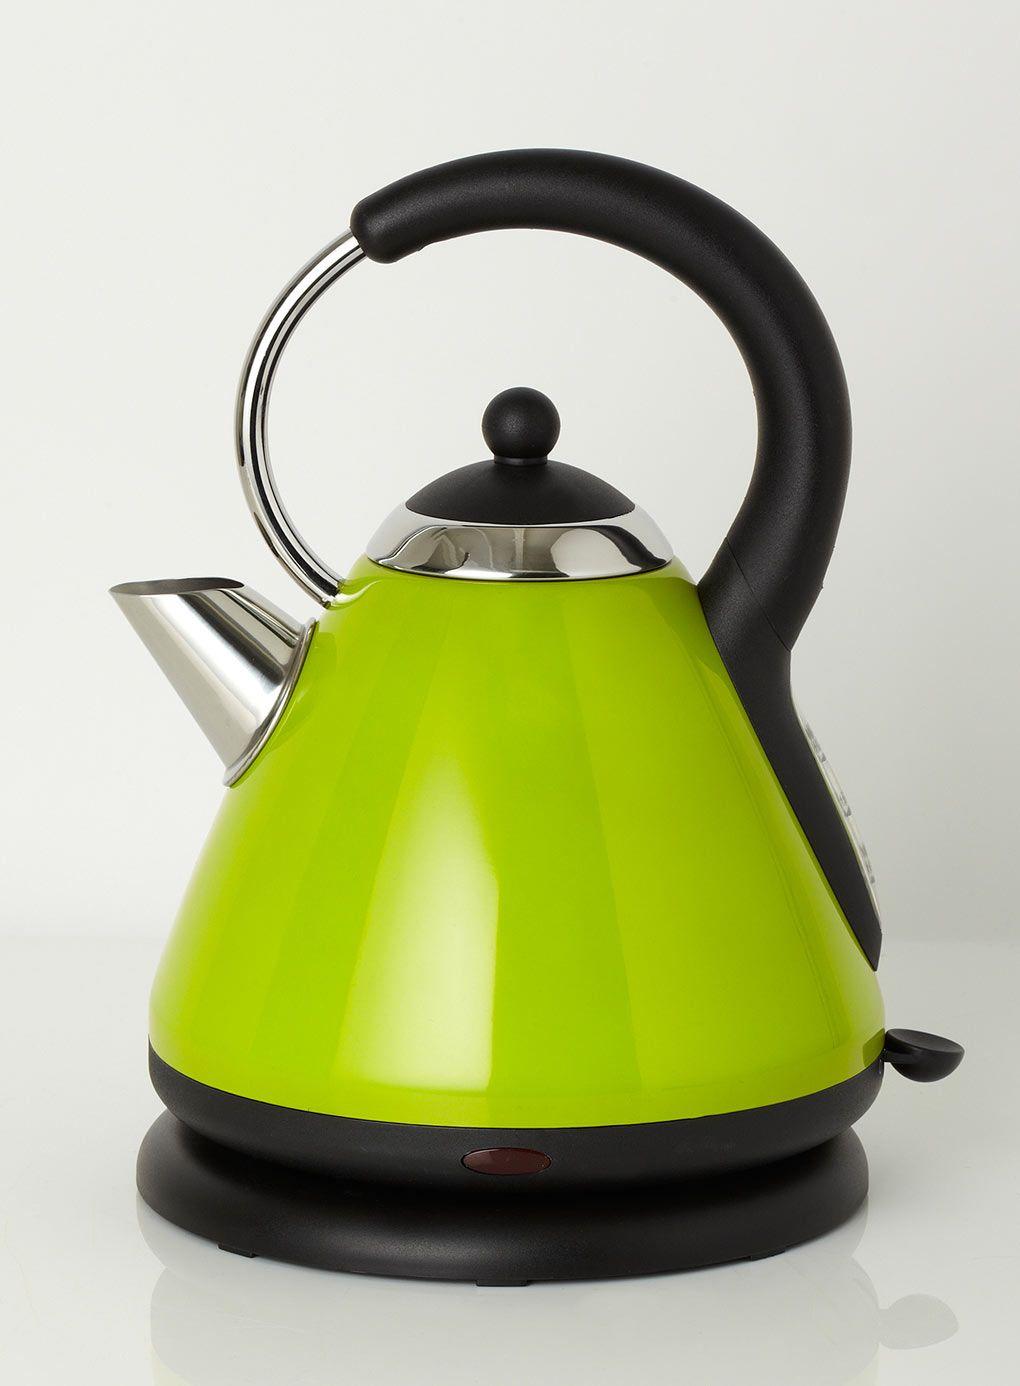 Kitchen small appliance essentials - Lime Essentials Pyramid Kettle